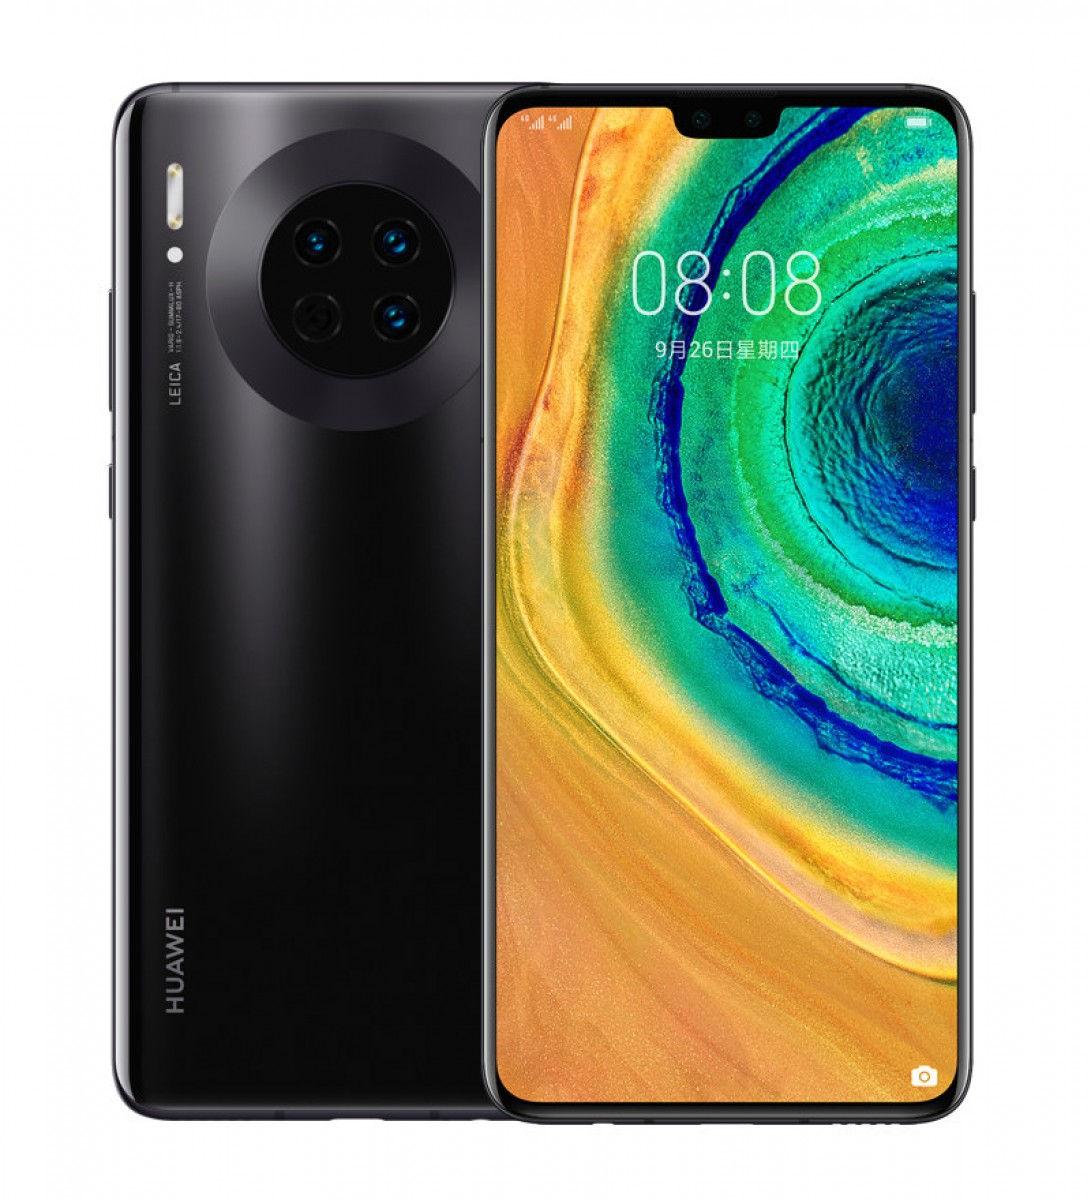 إطلاق Huawei Mate 30 و Mate 30 Pro مع Kirin 990 و Horizon ؛ السعر والمواصفات 1